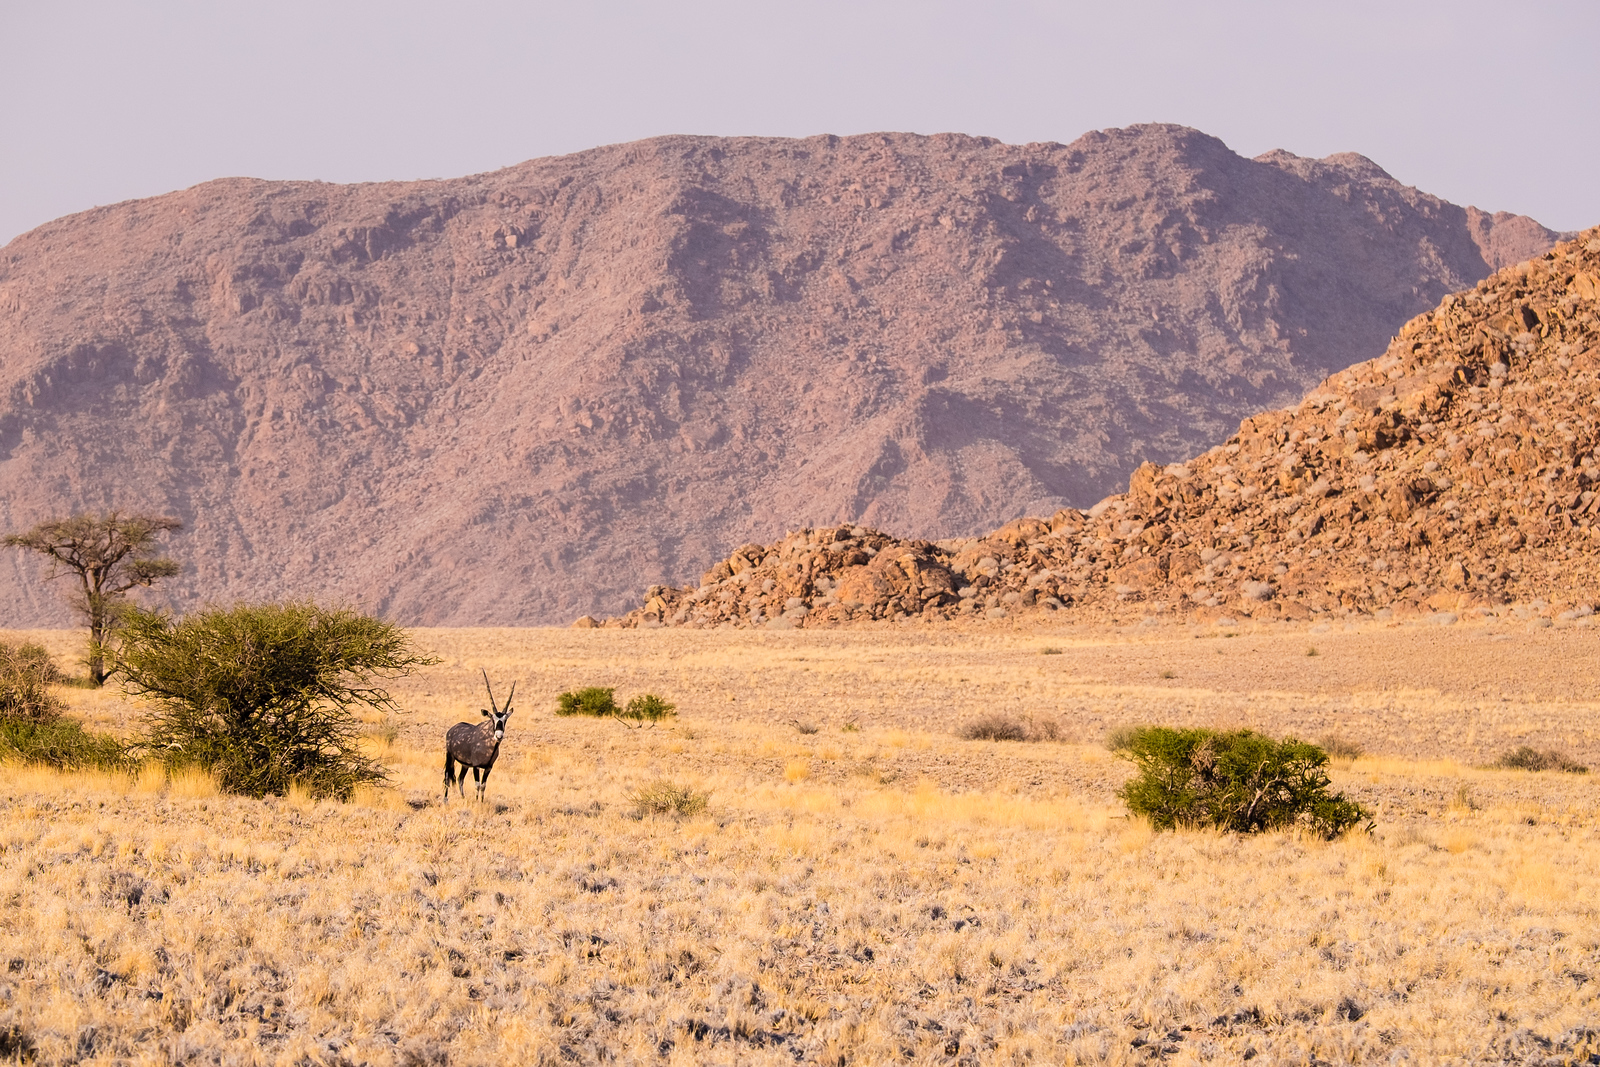 Lone Oryx in the Namib Desert